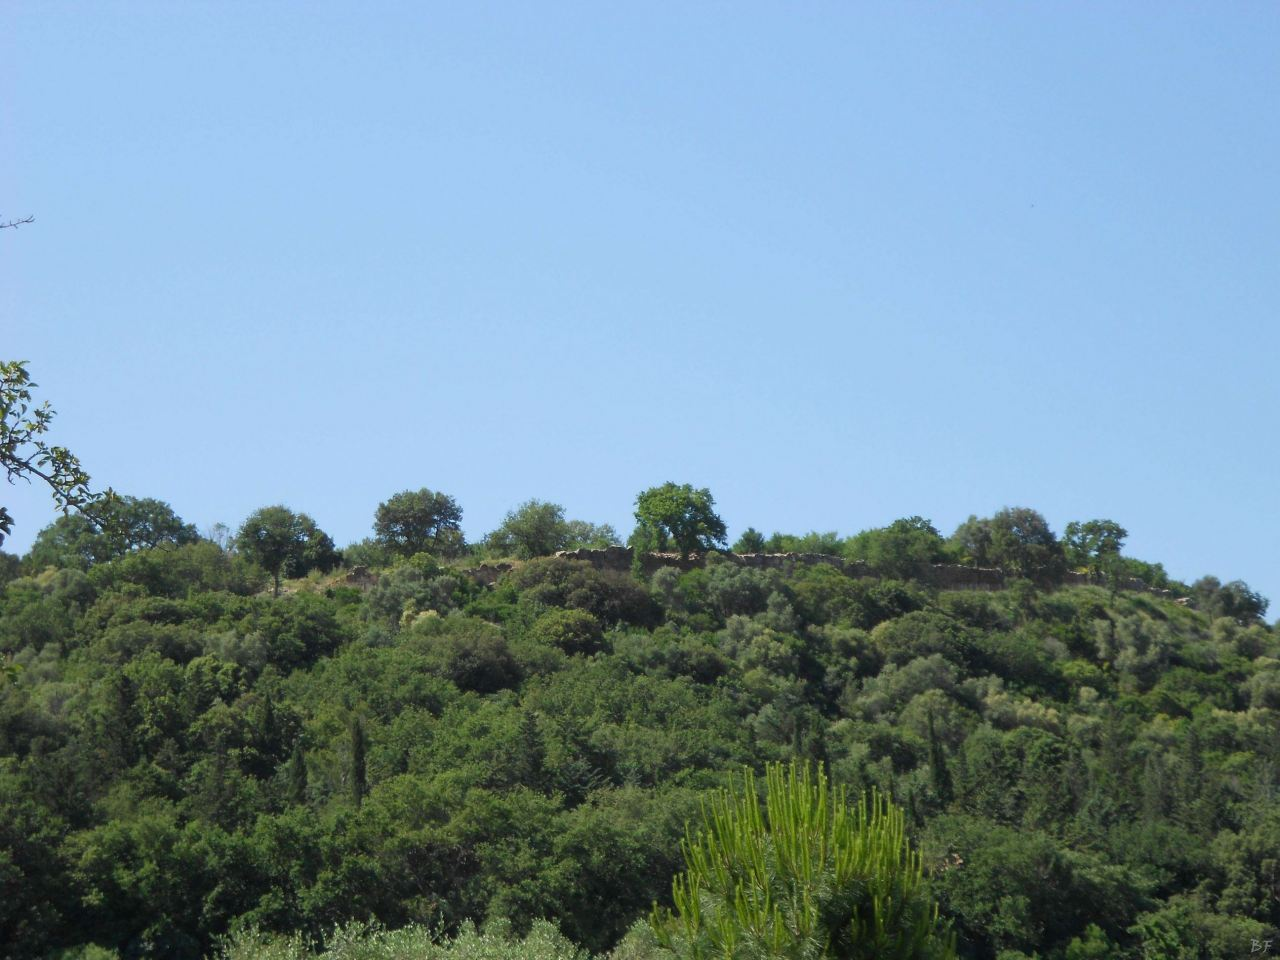 Roselle-Mura-Megalitiche-Roselle-Grosseto-Toscana-Italia-10